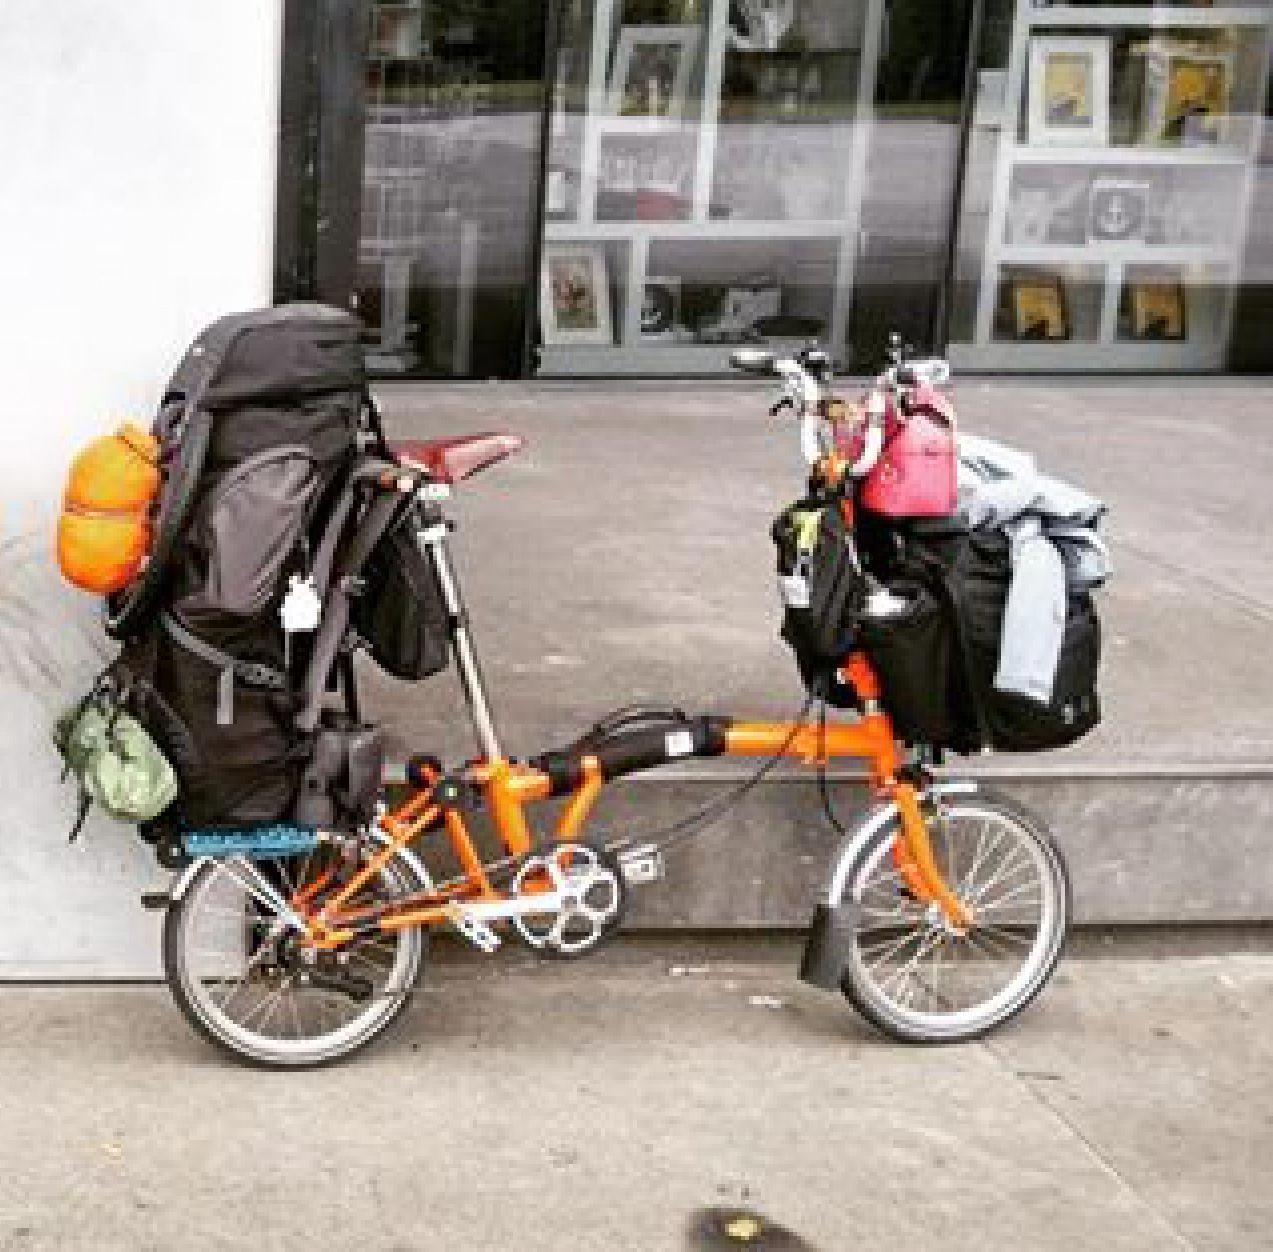 Bicycle Maintenance Touring Bike Bicycle Cycling Touring